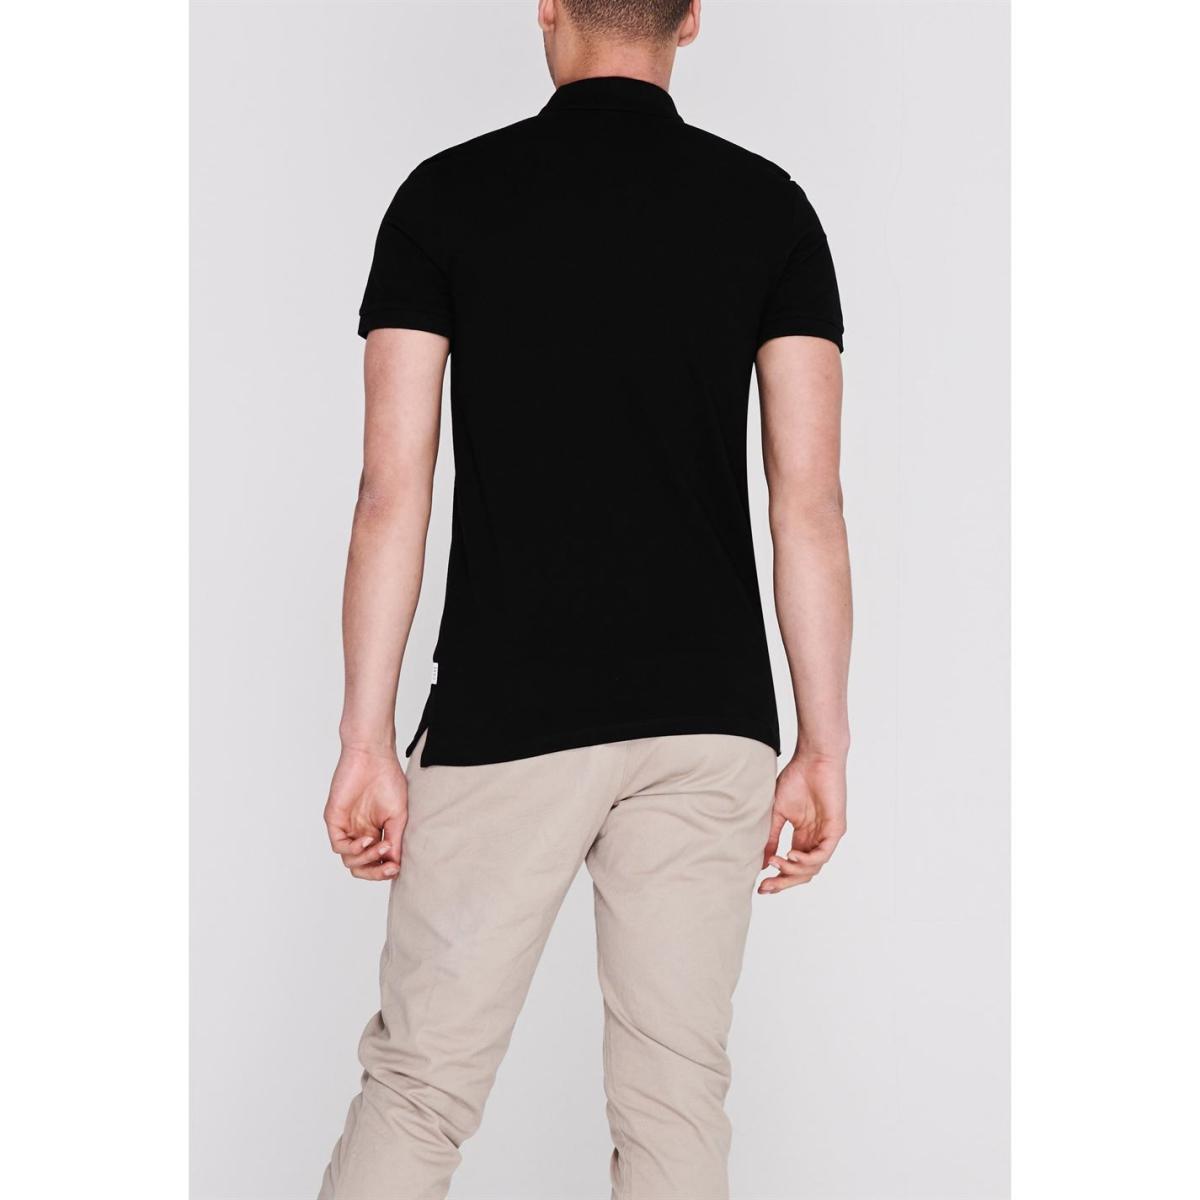 Jack And Jones Poloshirt T-Shirt Polohemd Herren 2173